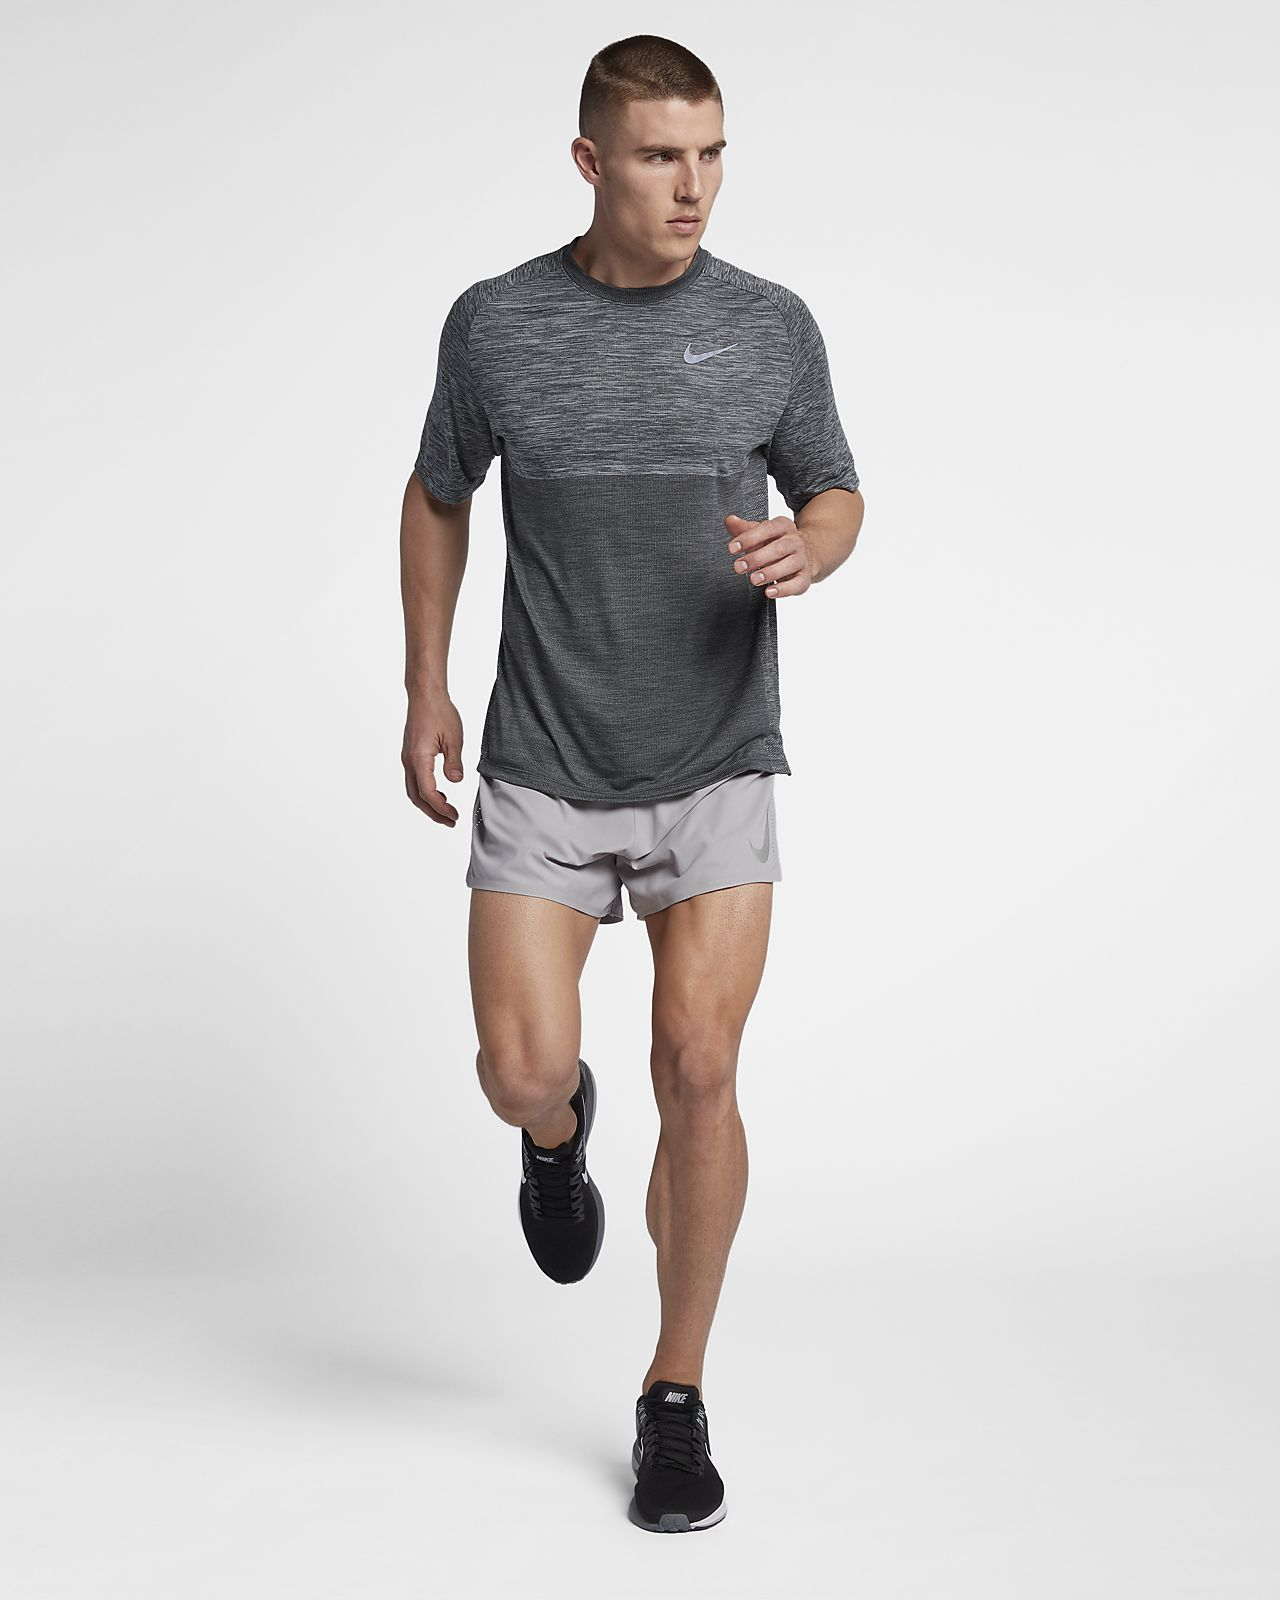 68703830 Nike Dri-FIT Medalist Men's Short-Sleeve Running Top. Nike.com GB